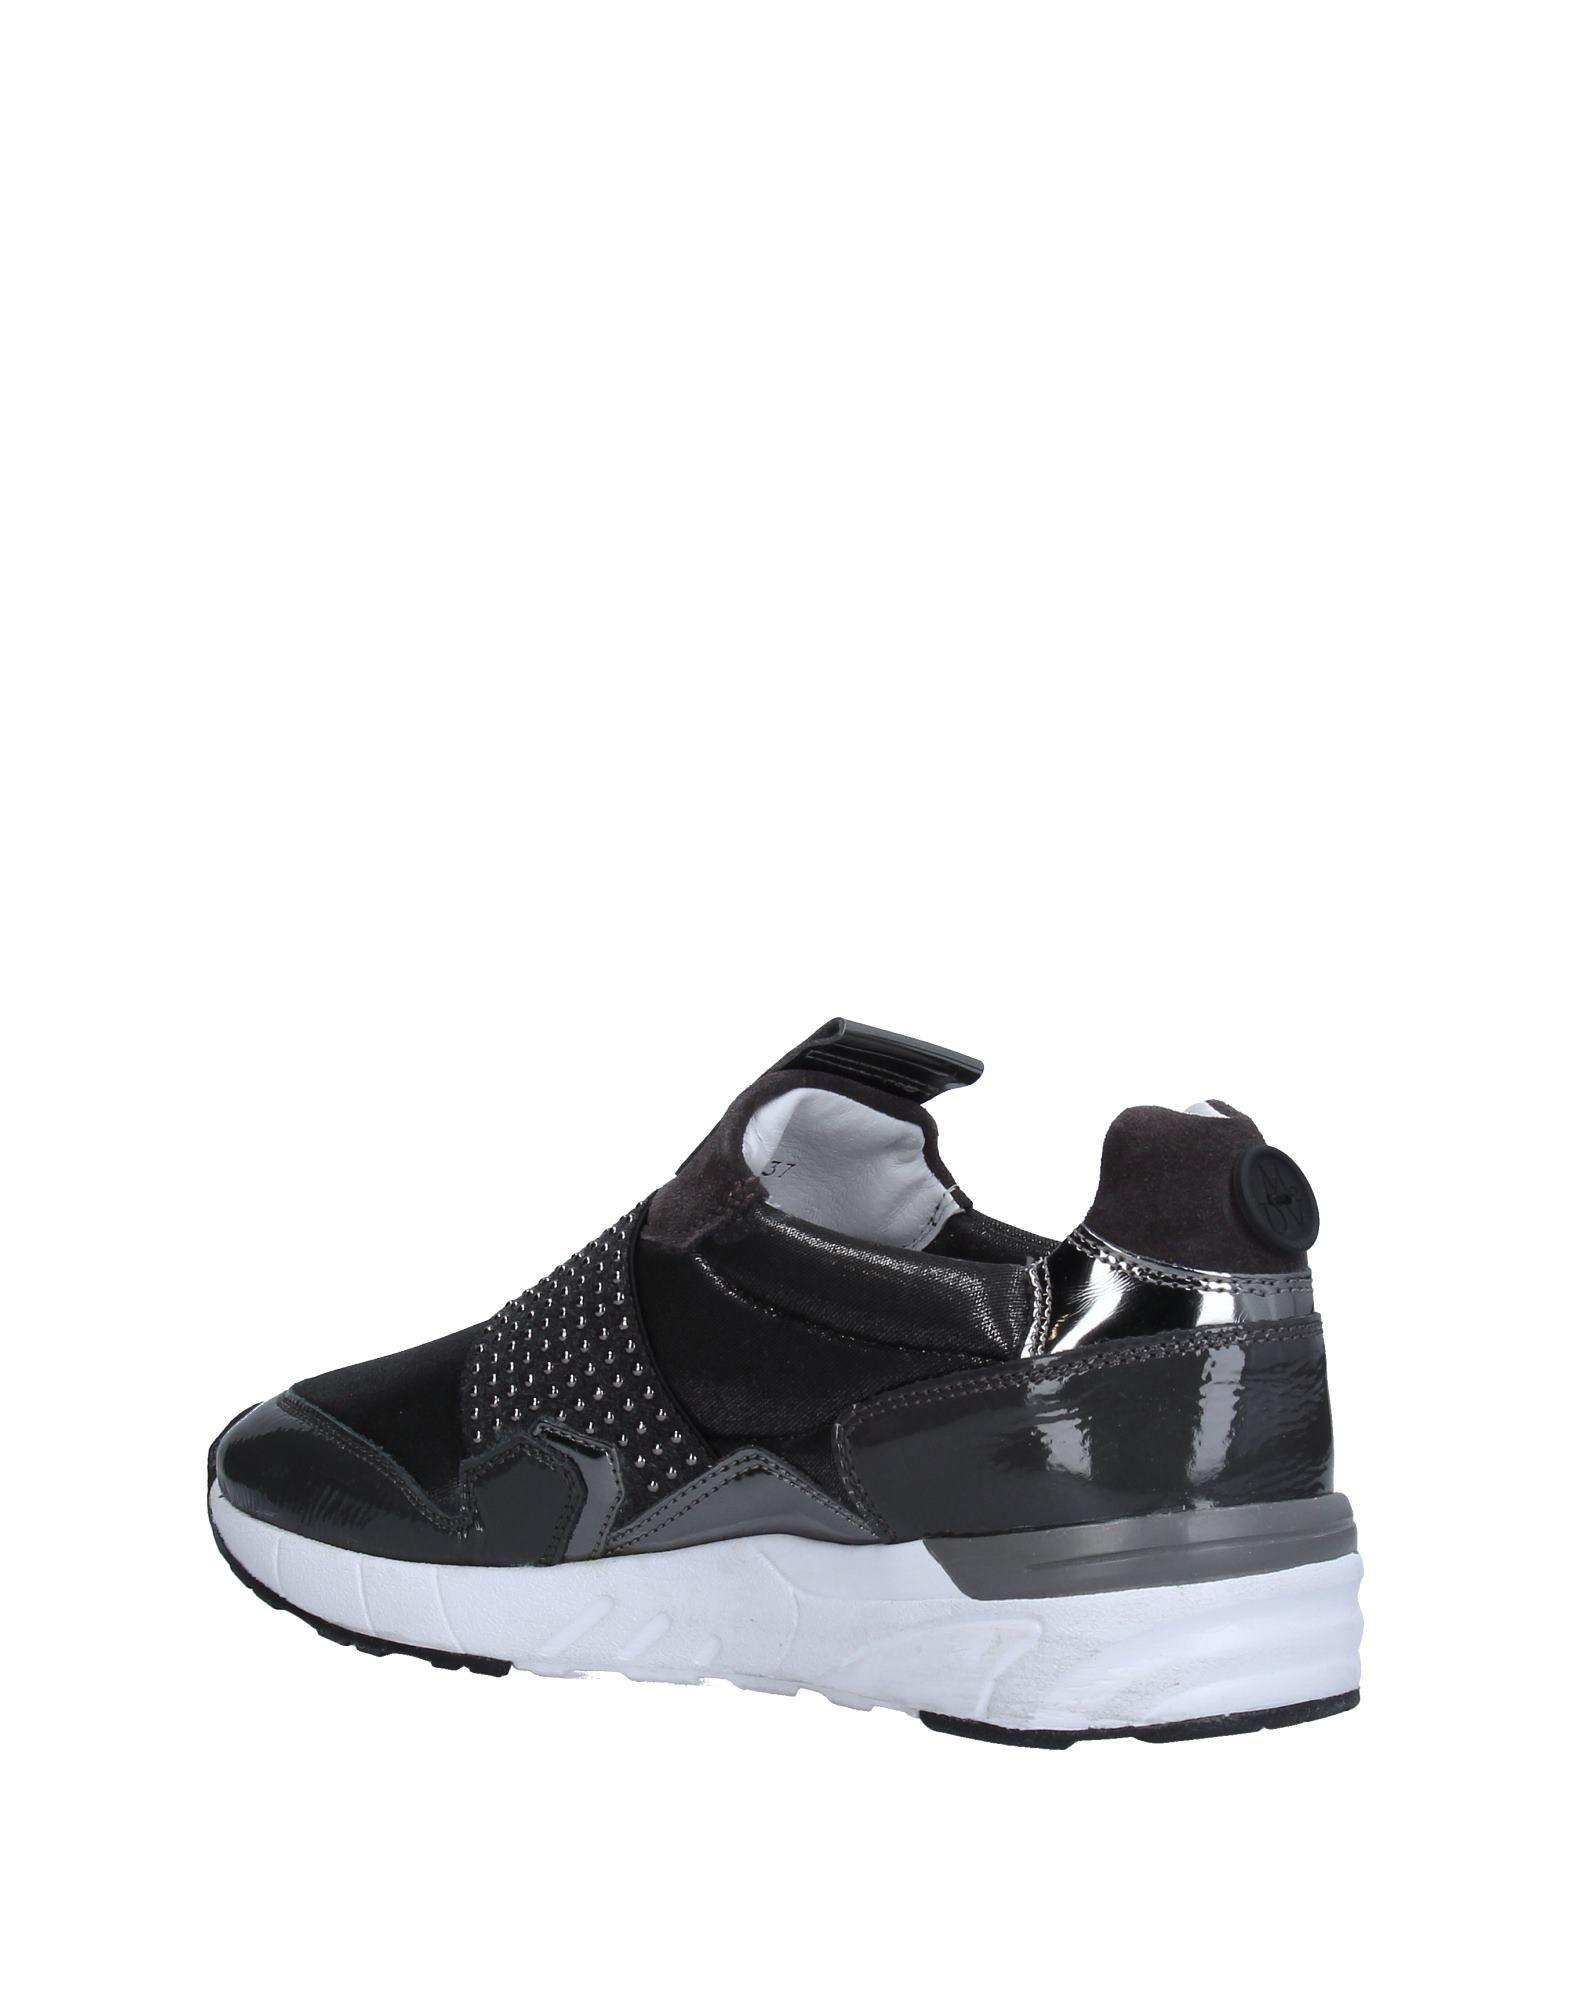 Mariano Di Vaio Sneakers Damen Damen Sneakers  11248090RN Gute Qualität beliebte Schuhe 23cf79